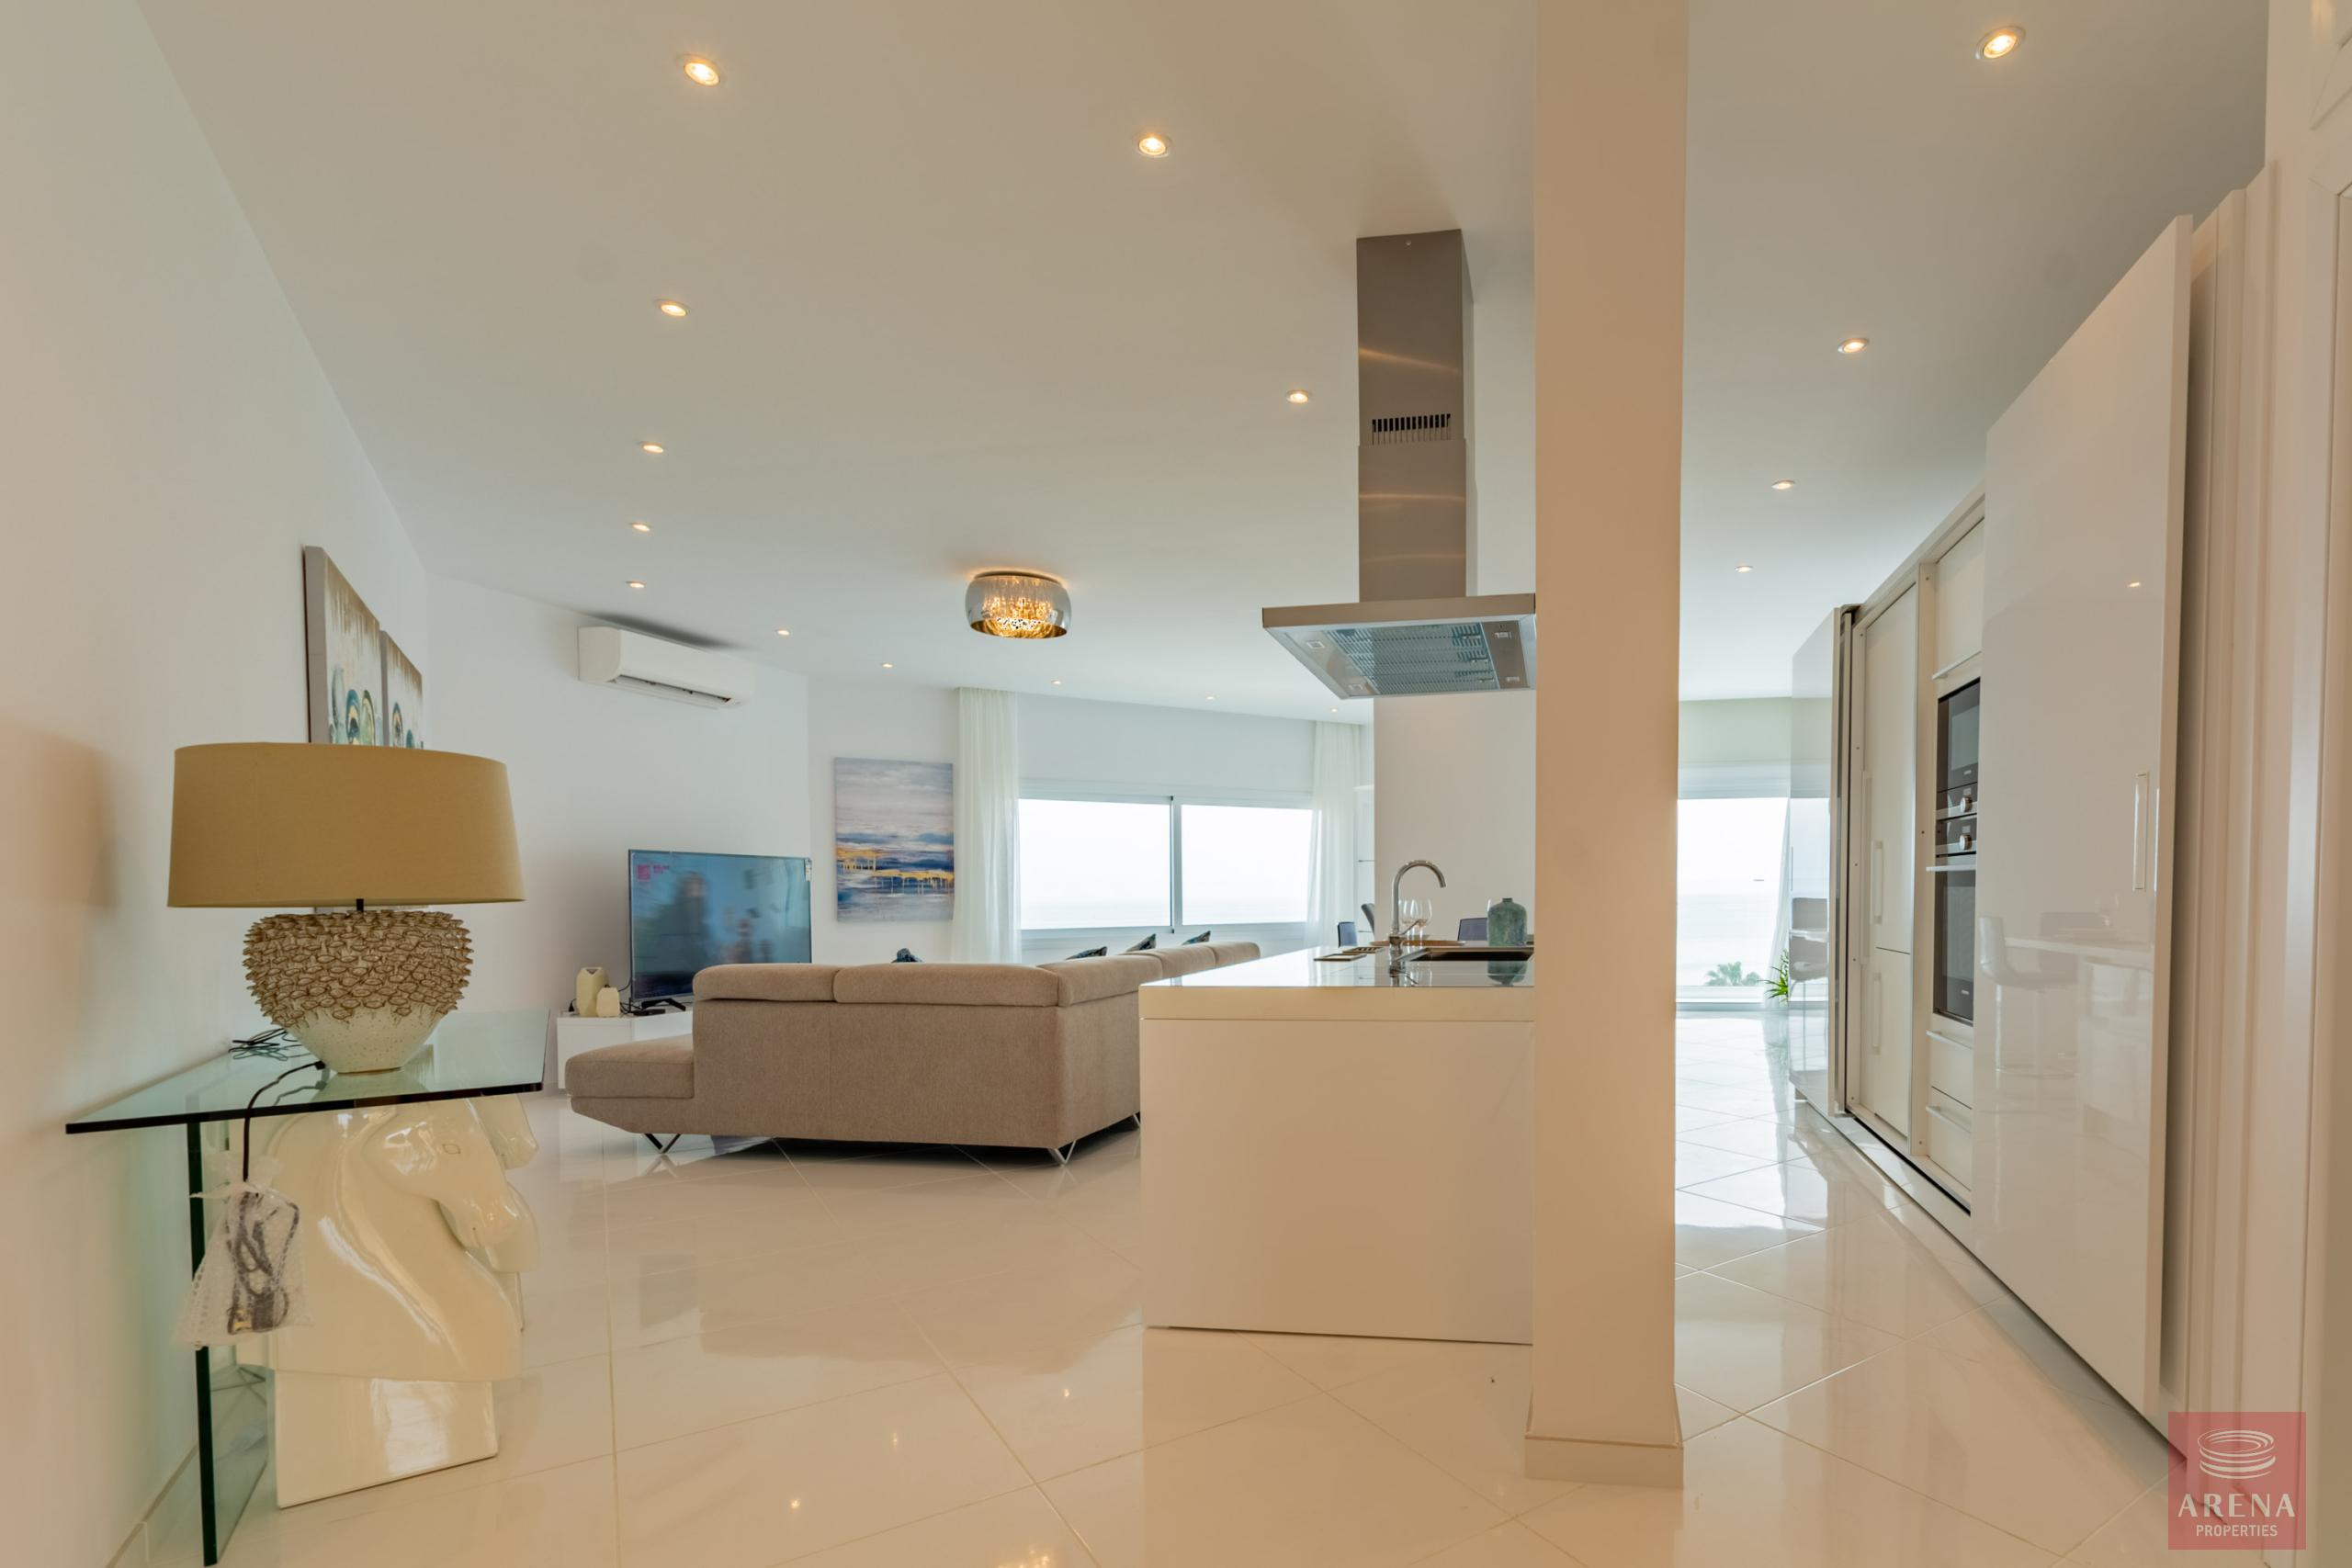 Apartment in Ayia Triada for sale